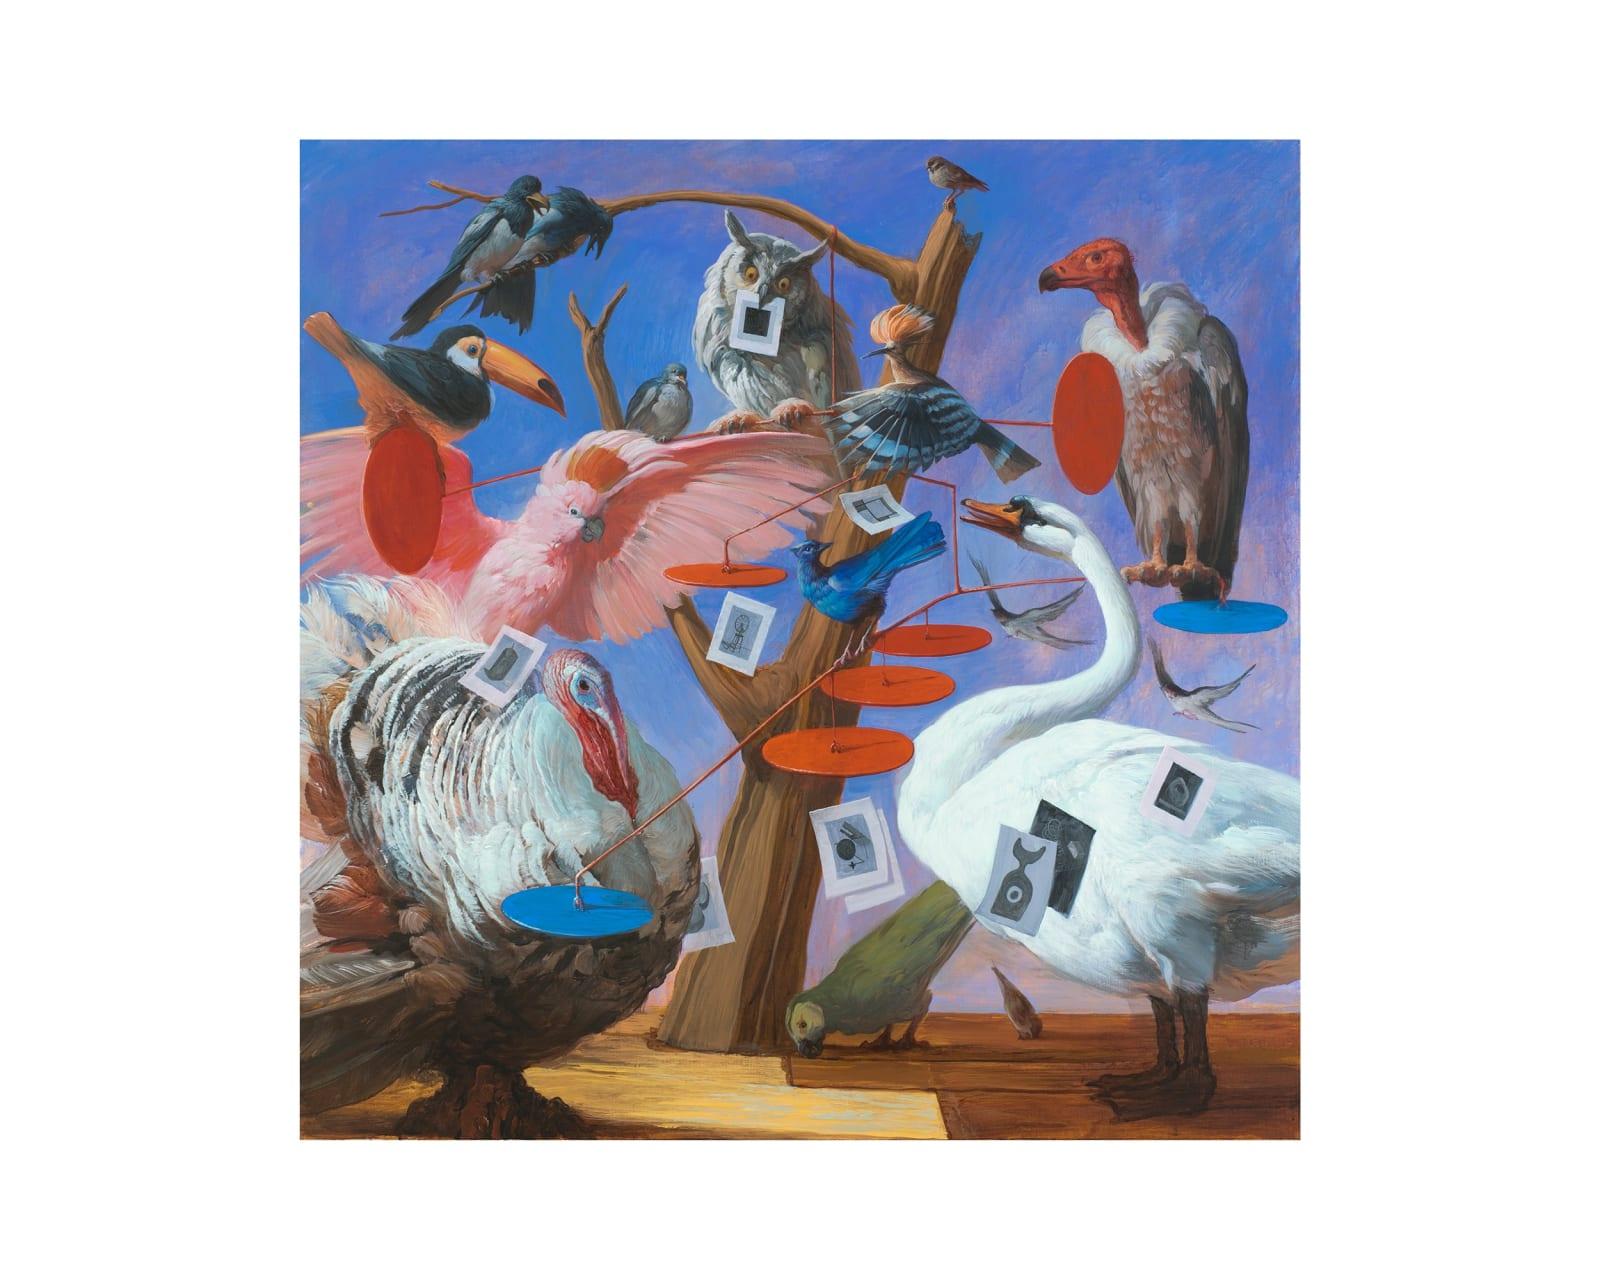 Егор Кошелев | Egor Koshelev Угадайка | Guessing, 2020 Холст, масло | oil on canvas 150 х 150 см